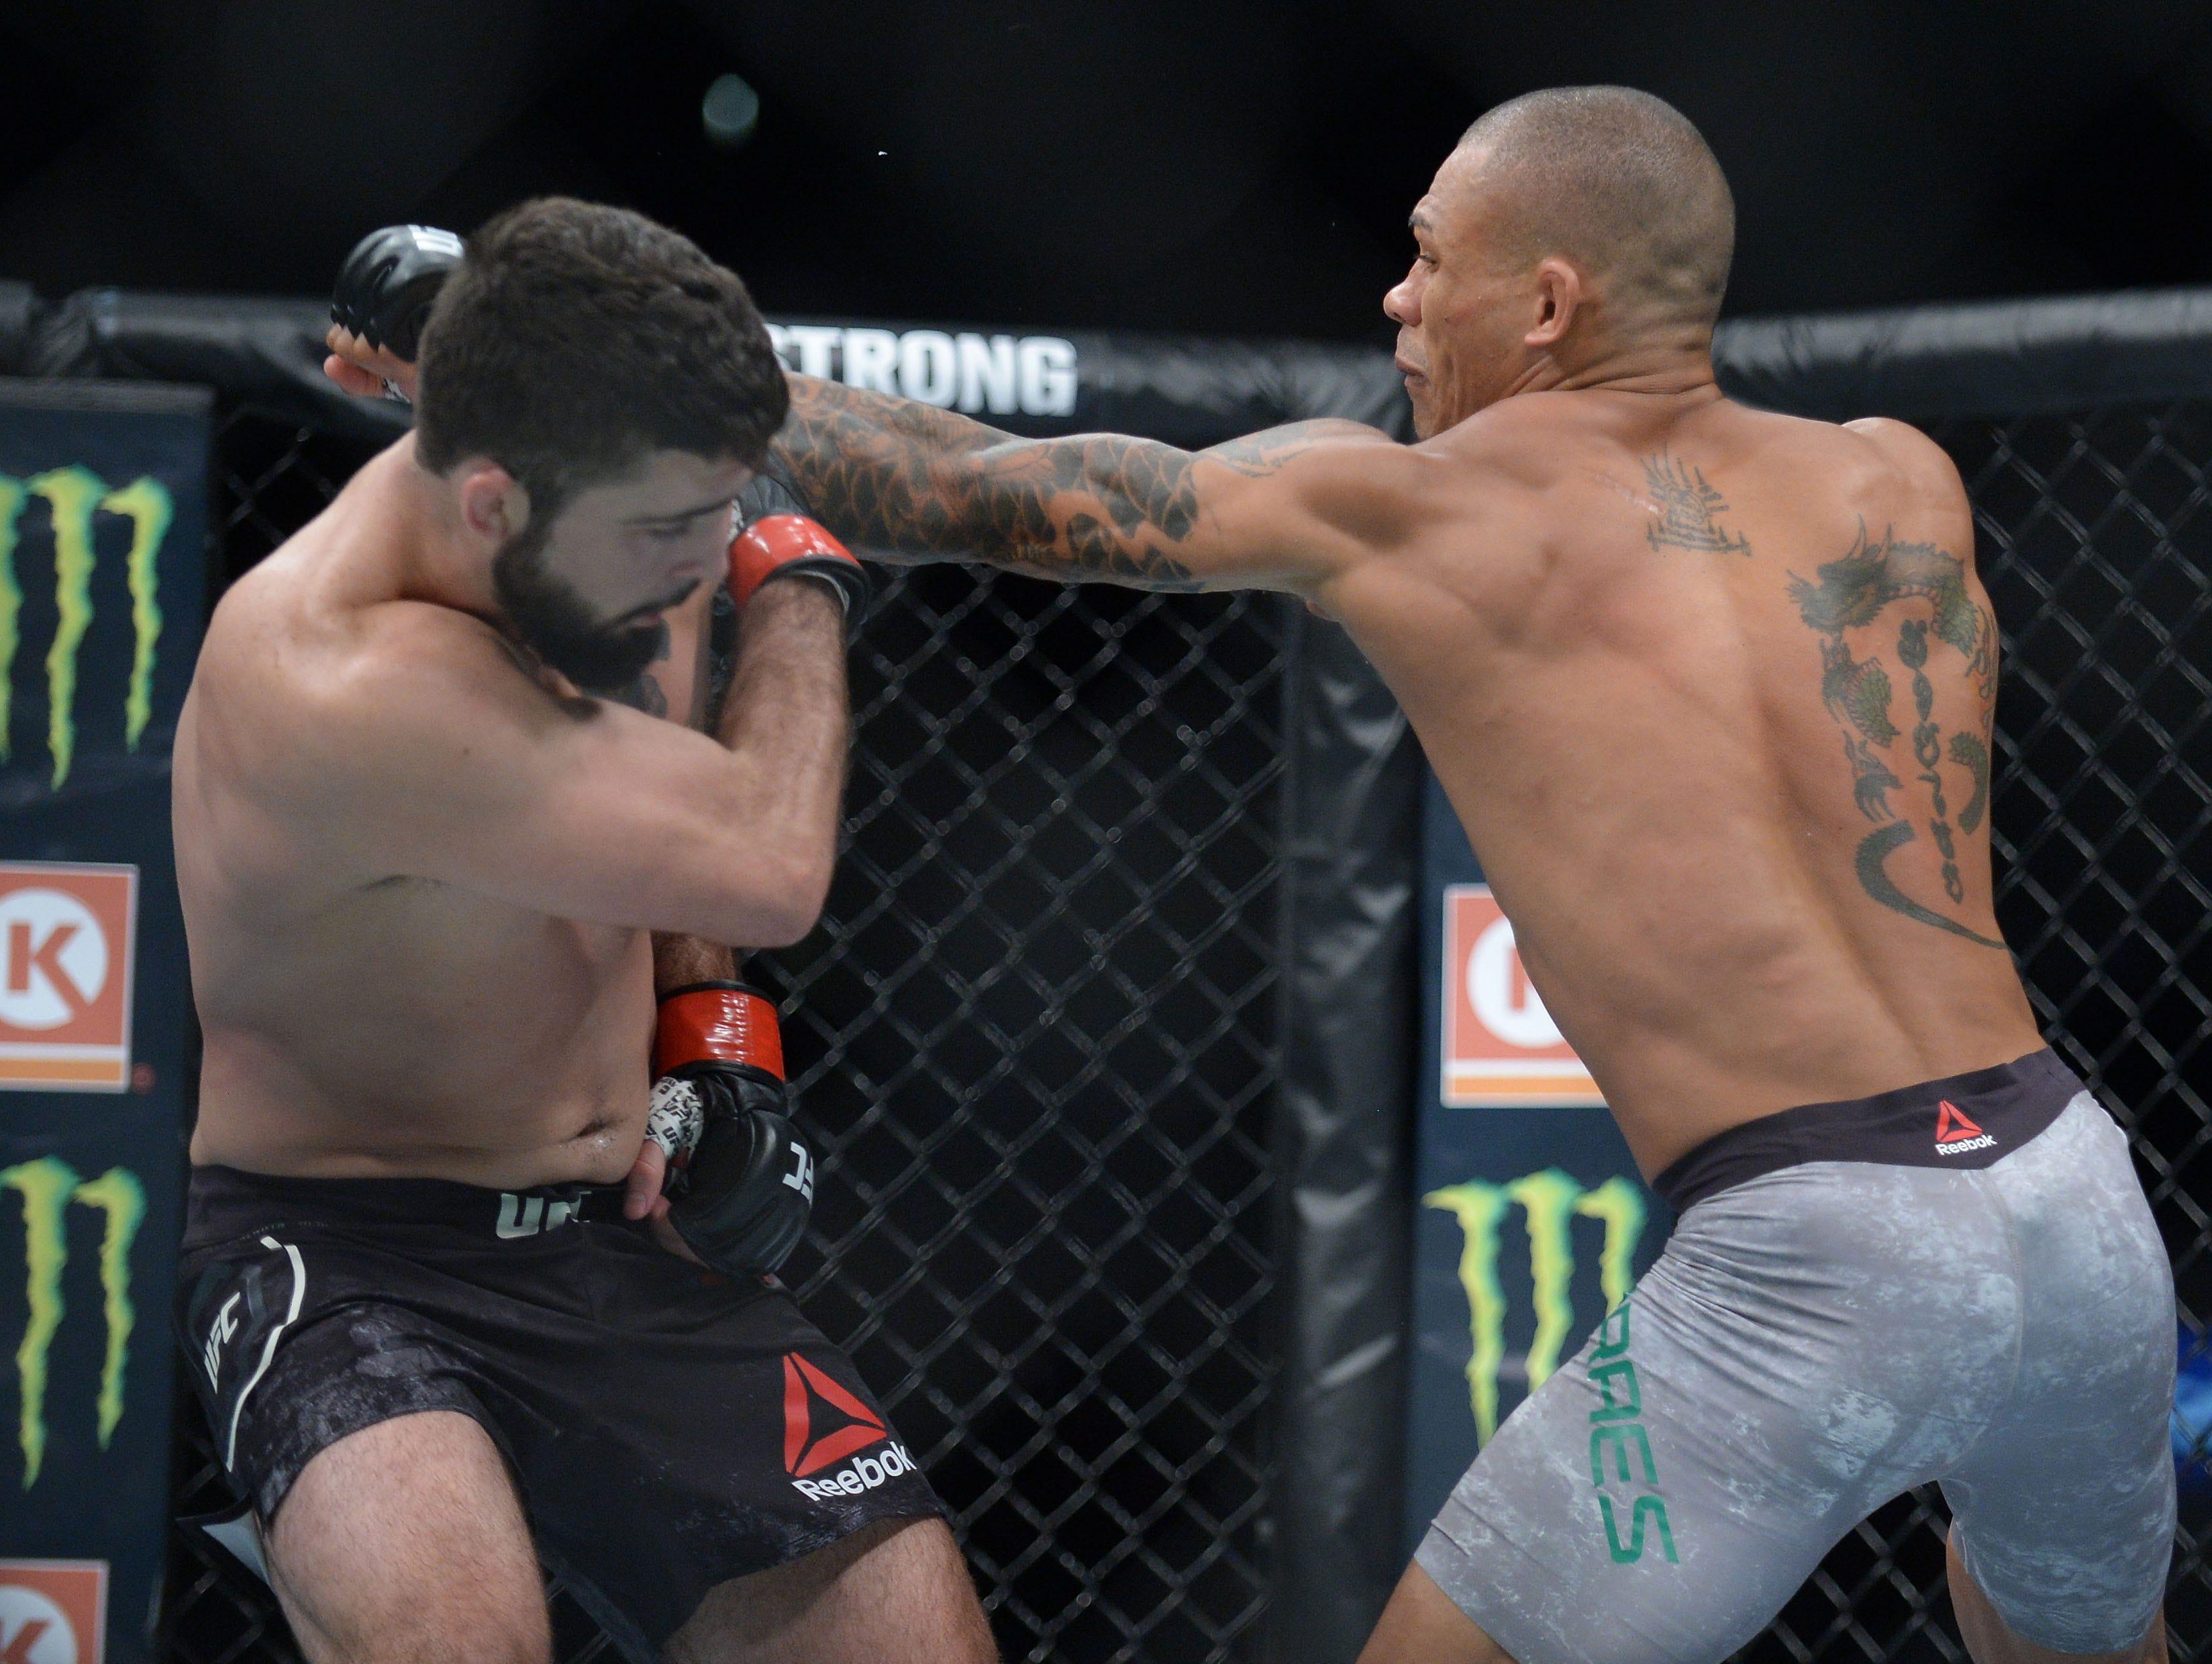 Sheymon Moreas lands a hit against Matt Sayles during UFC 227 at Staples Center.